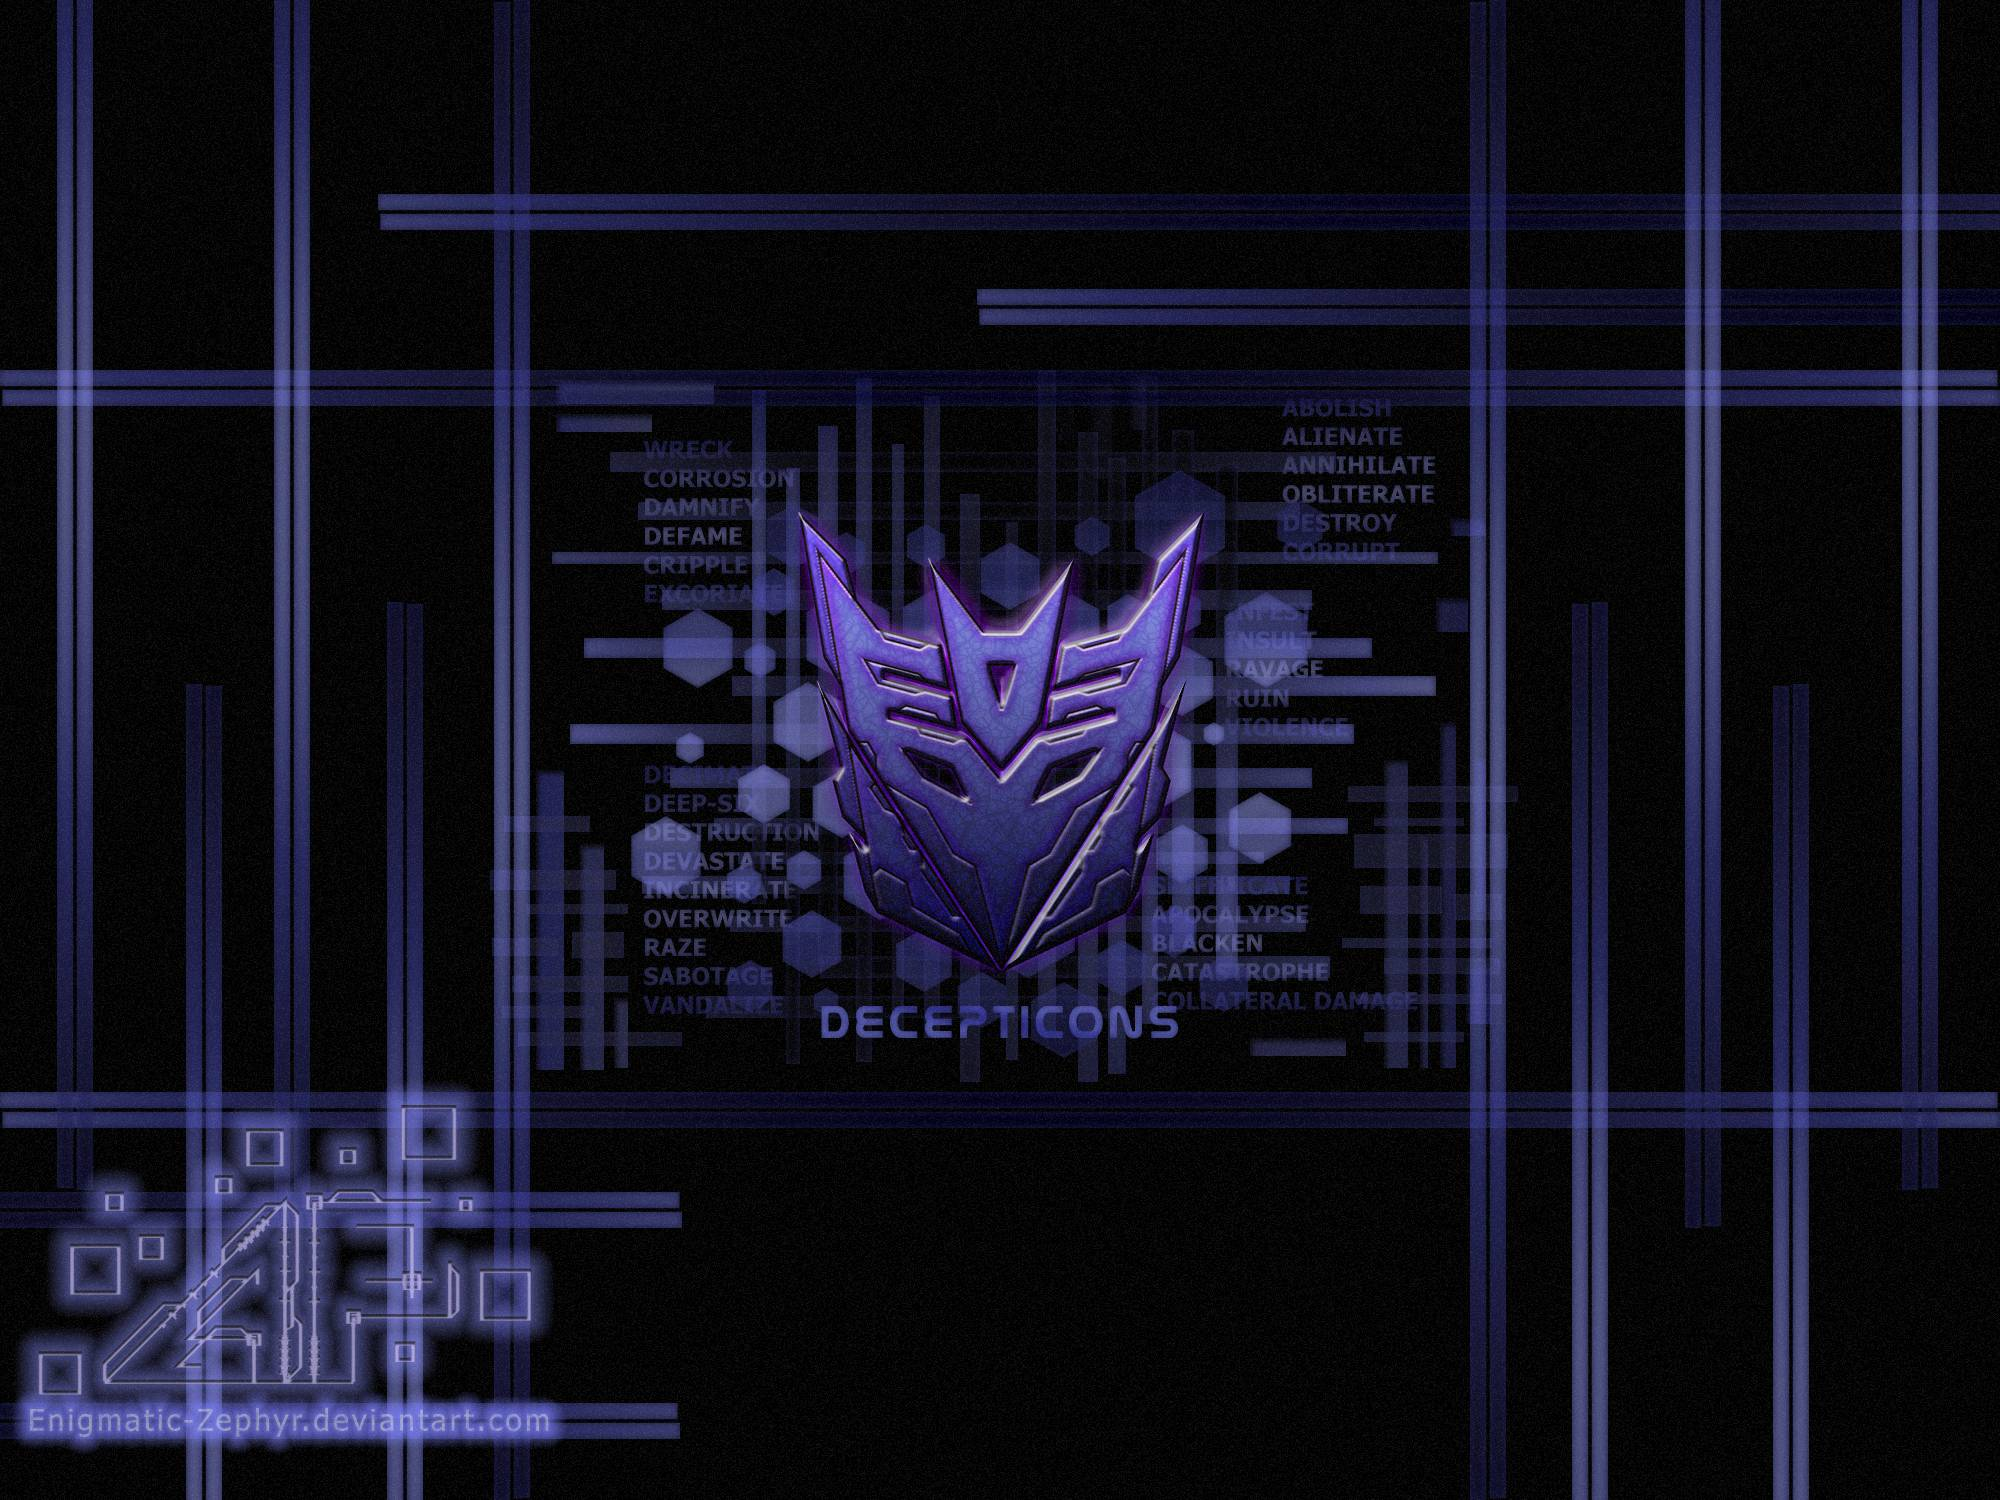 Transformers Fall Of Cybertron Wallpaper Decepticon Logo Wallpapers Wallpaper Cave